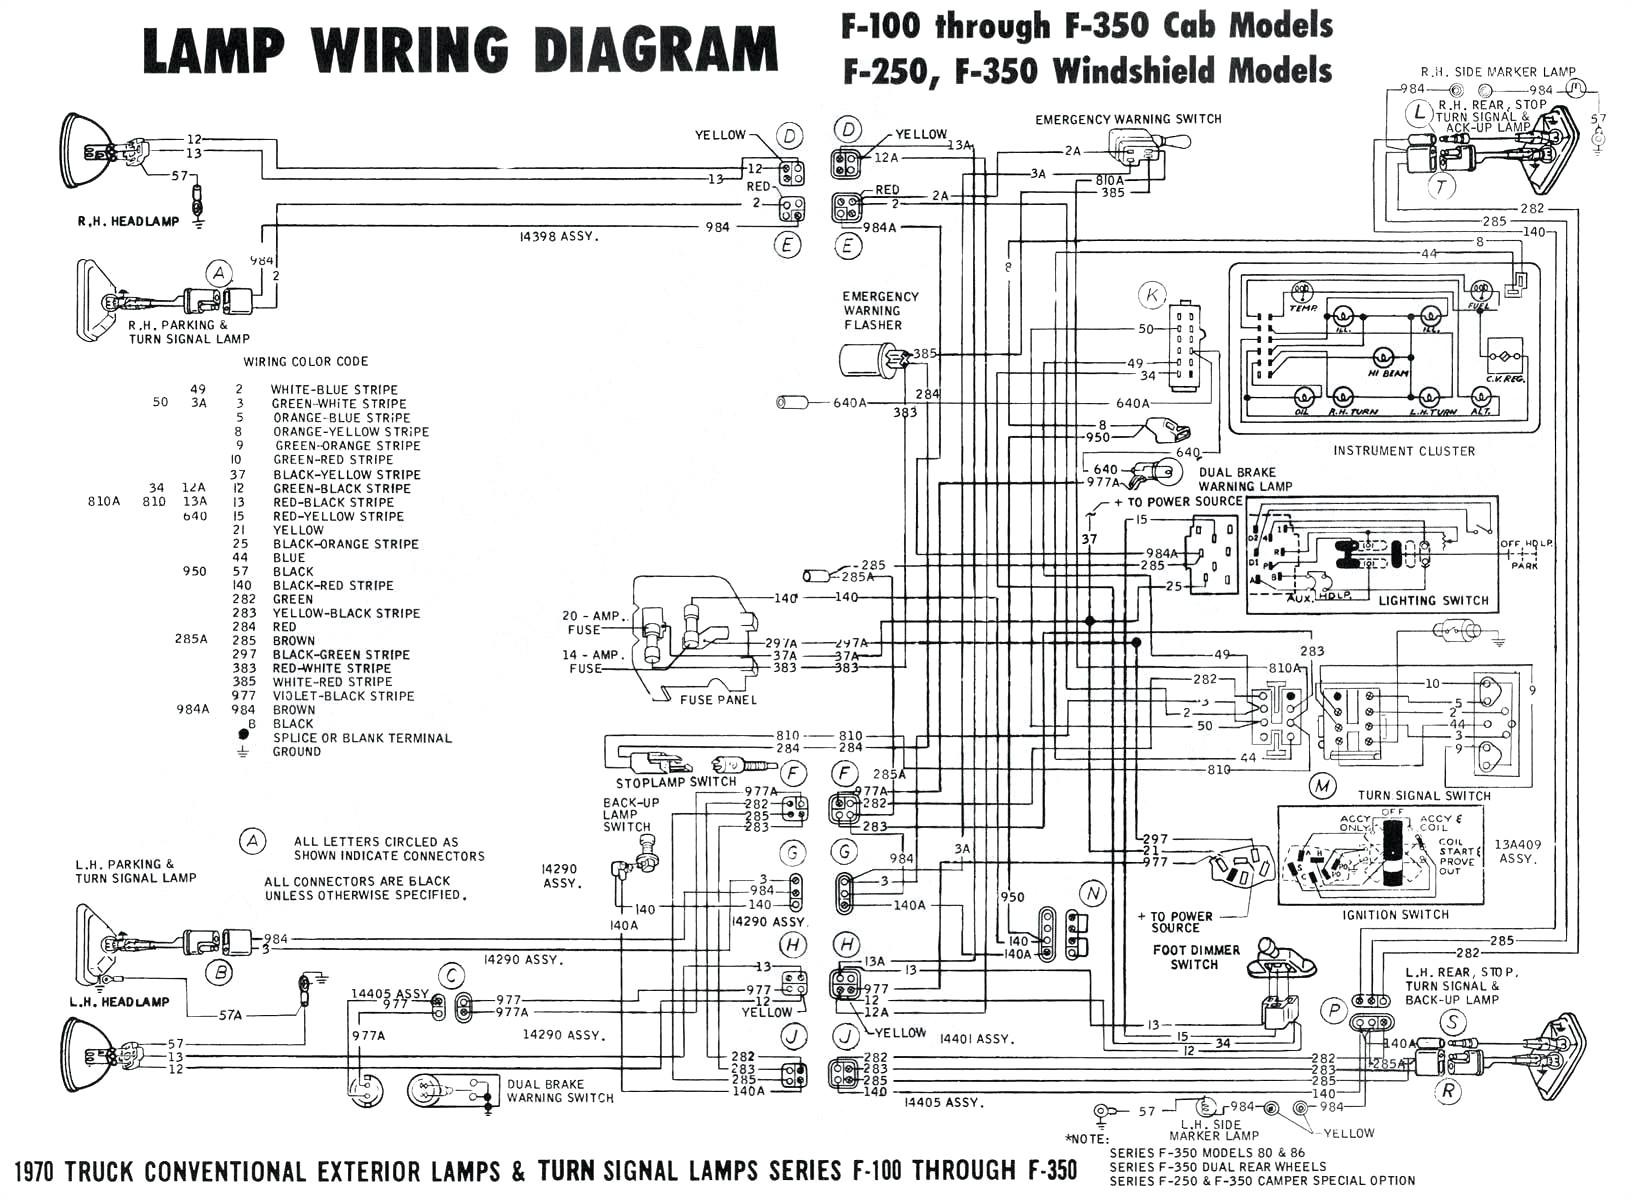 chevy silverado tail light wiring diagram brake manual new 1995 truck fresh 1984 ford 8c at tru jpg